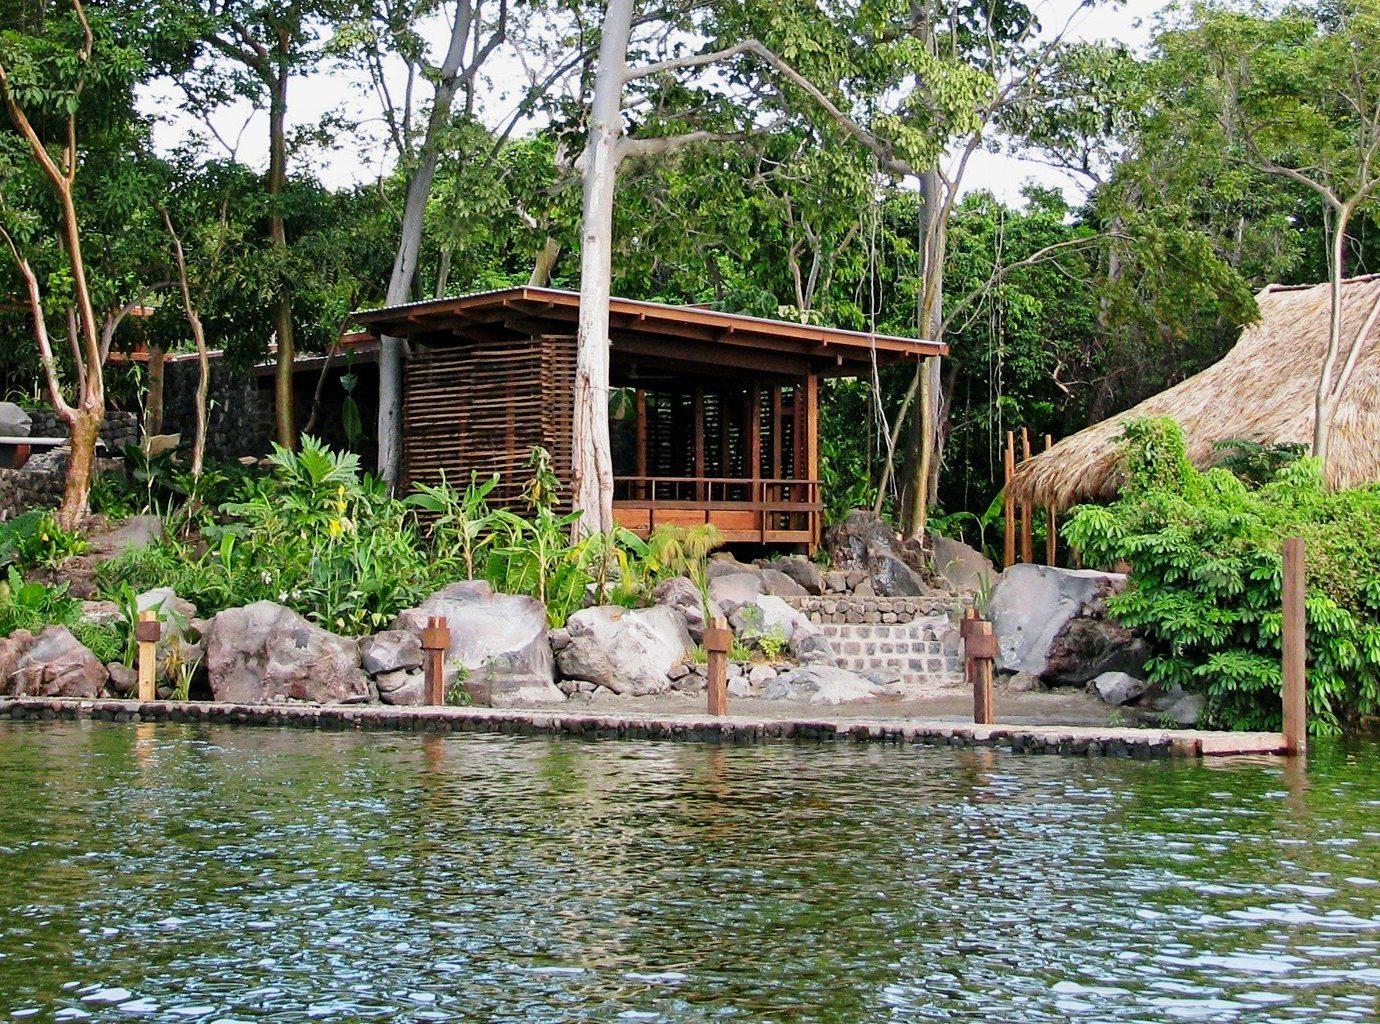 Hotels Outdoors + Adventure tree outdoor Resort rock pond Jungle Nature zoo backyard Garden Village swimming pool stone several